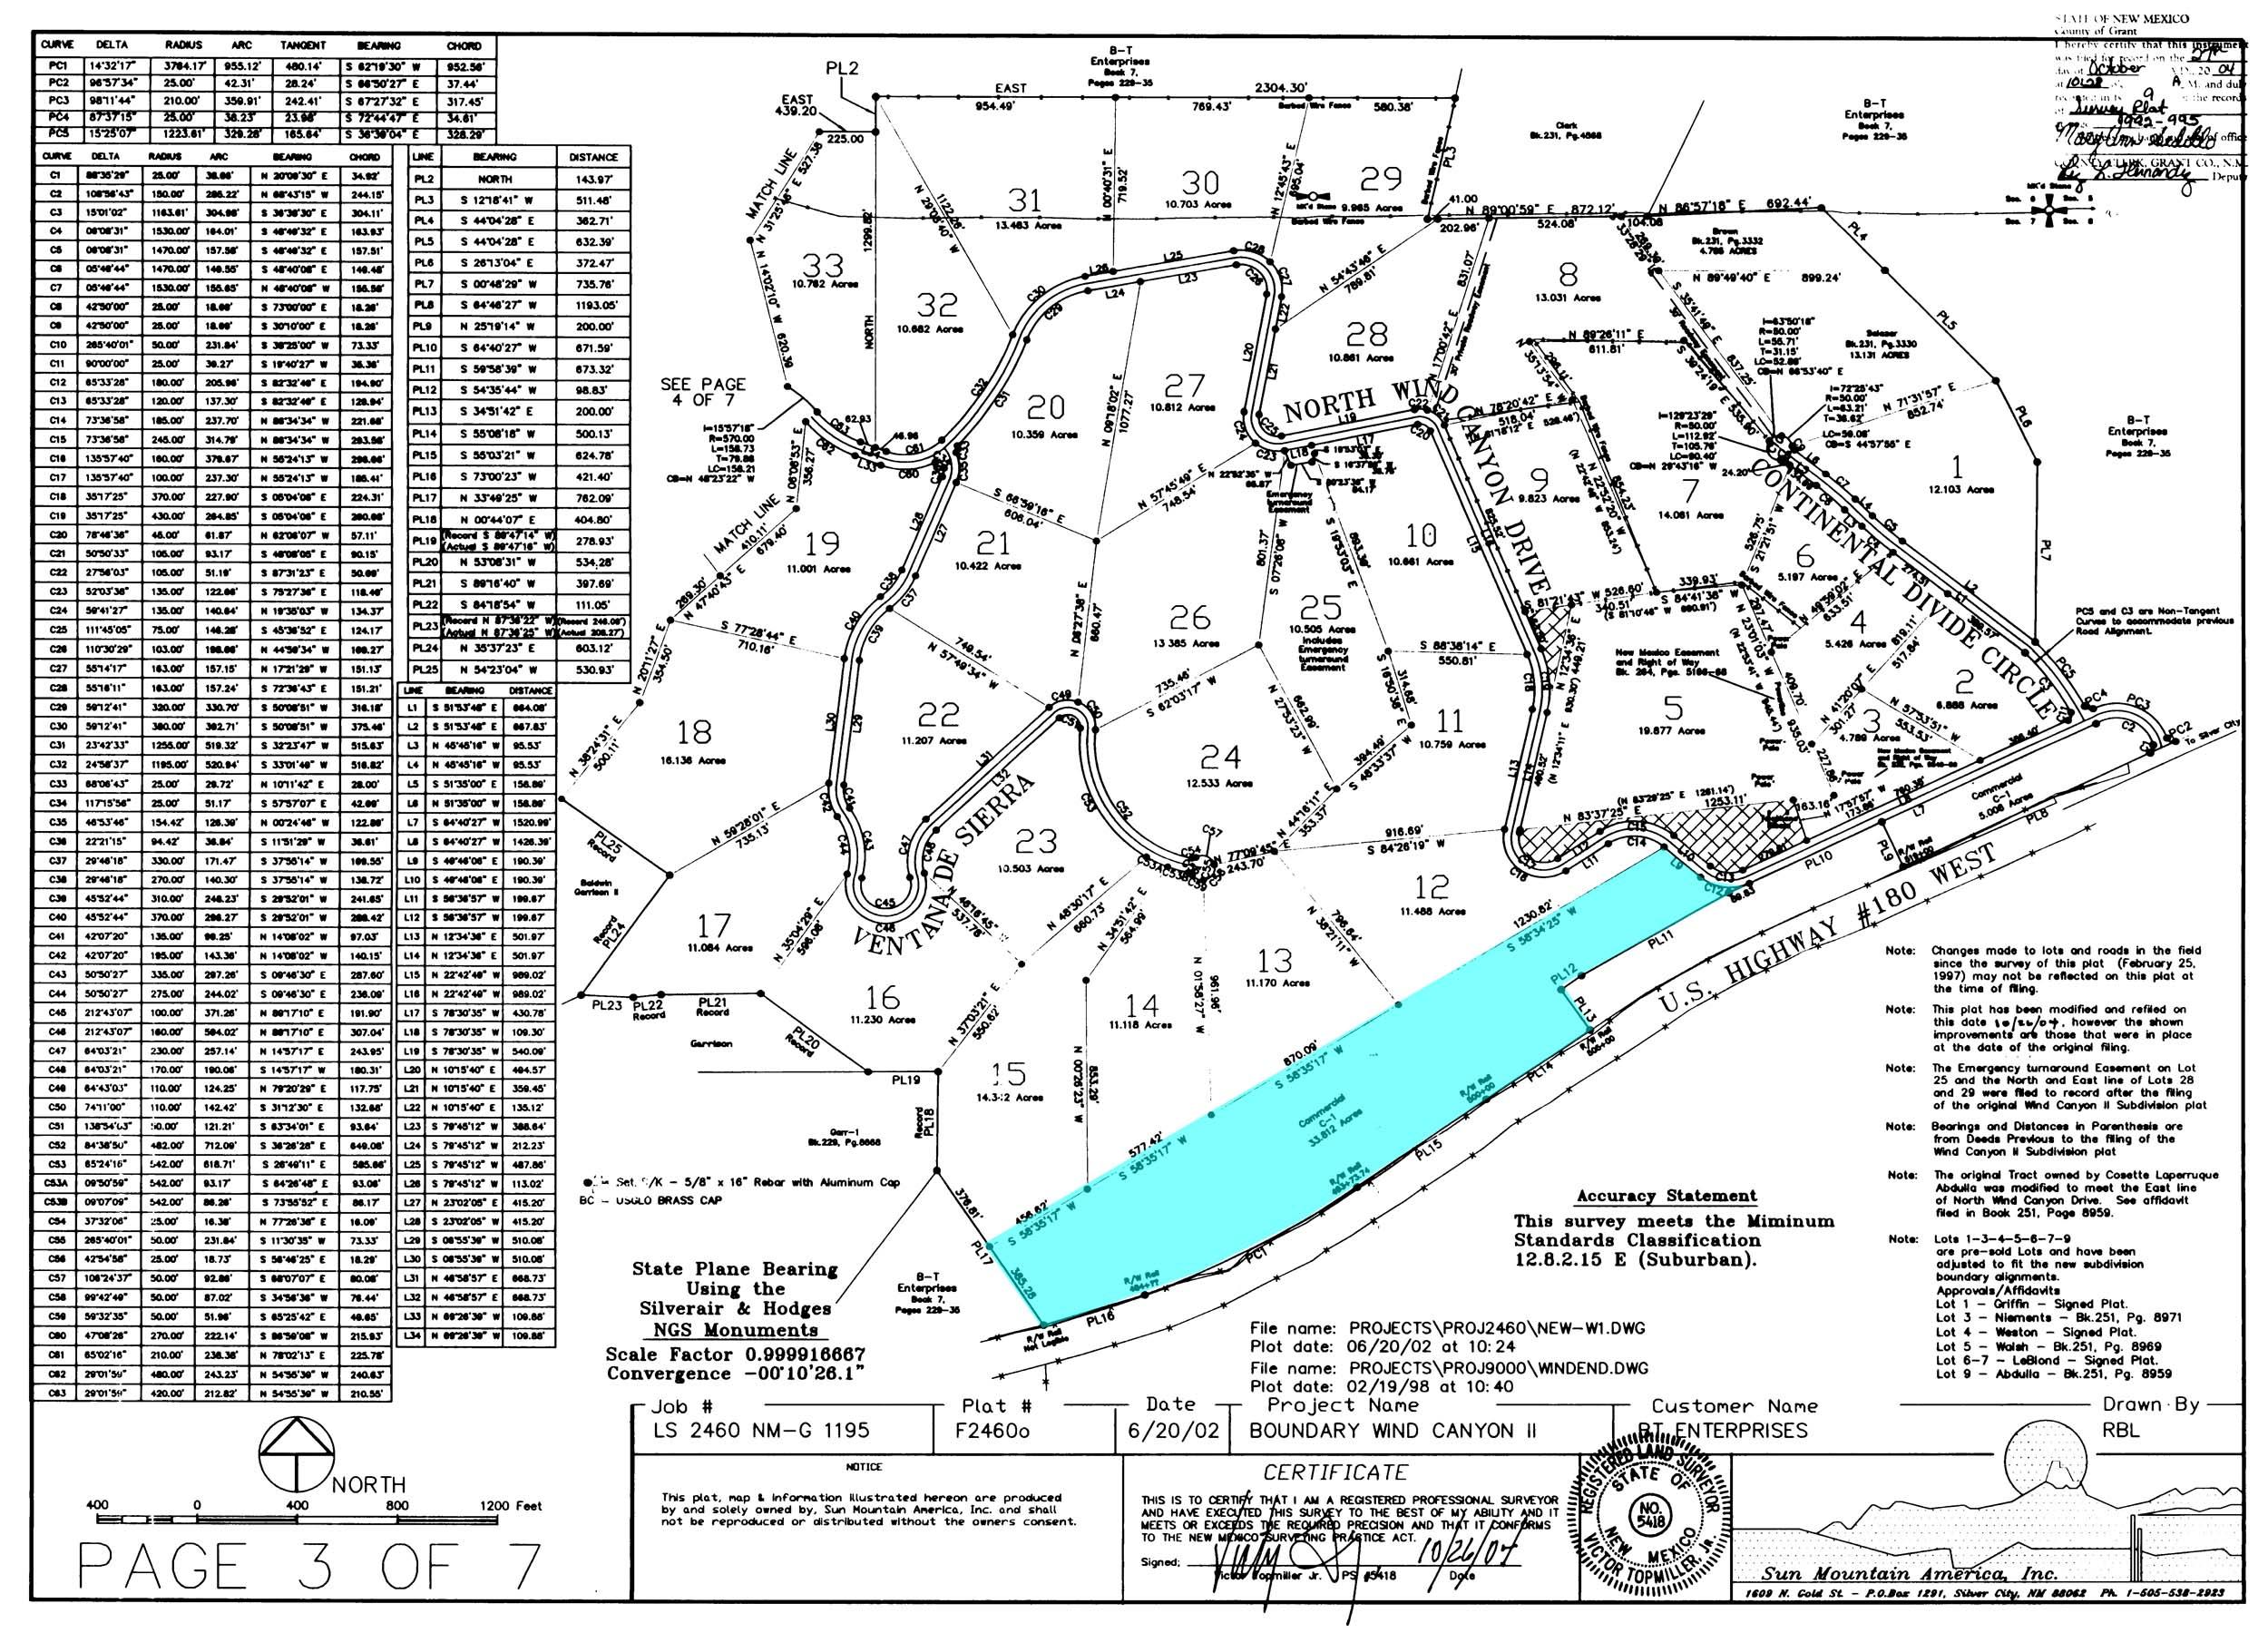 GRNM-2268, Plat Map.jpg